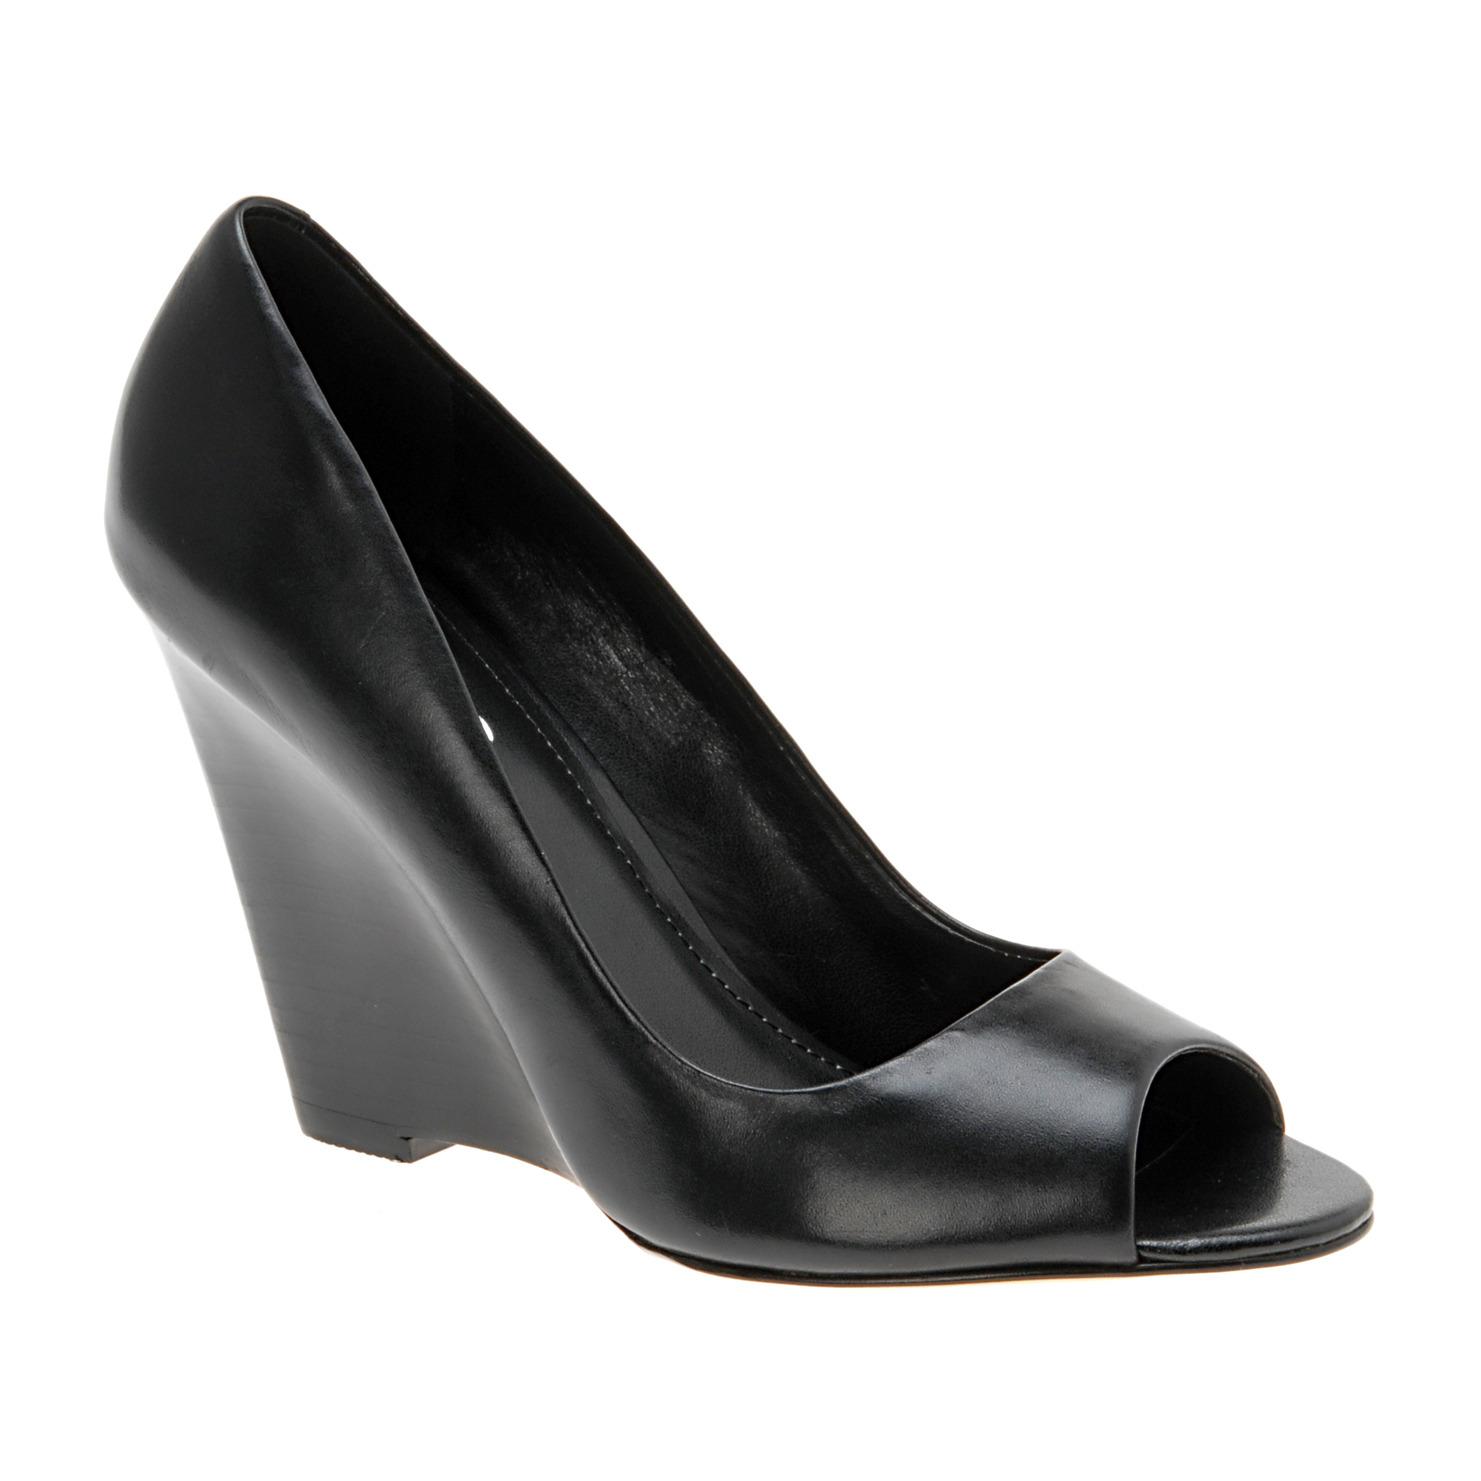 pbs sports aldo black peep toe wedge heels sz 8 retail 80